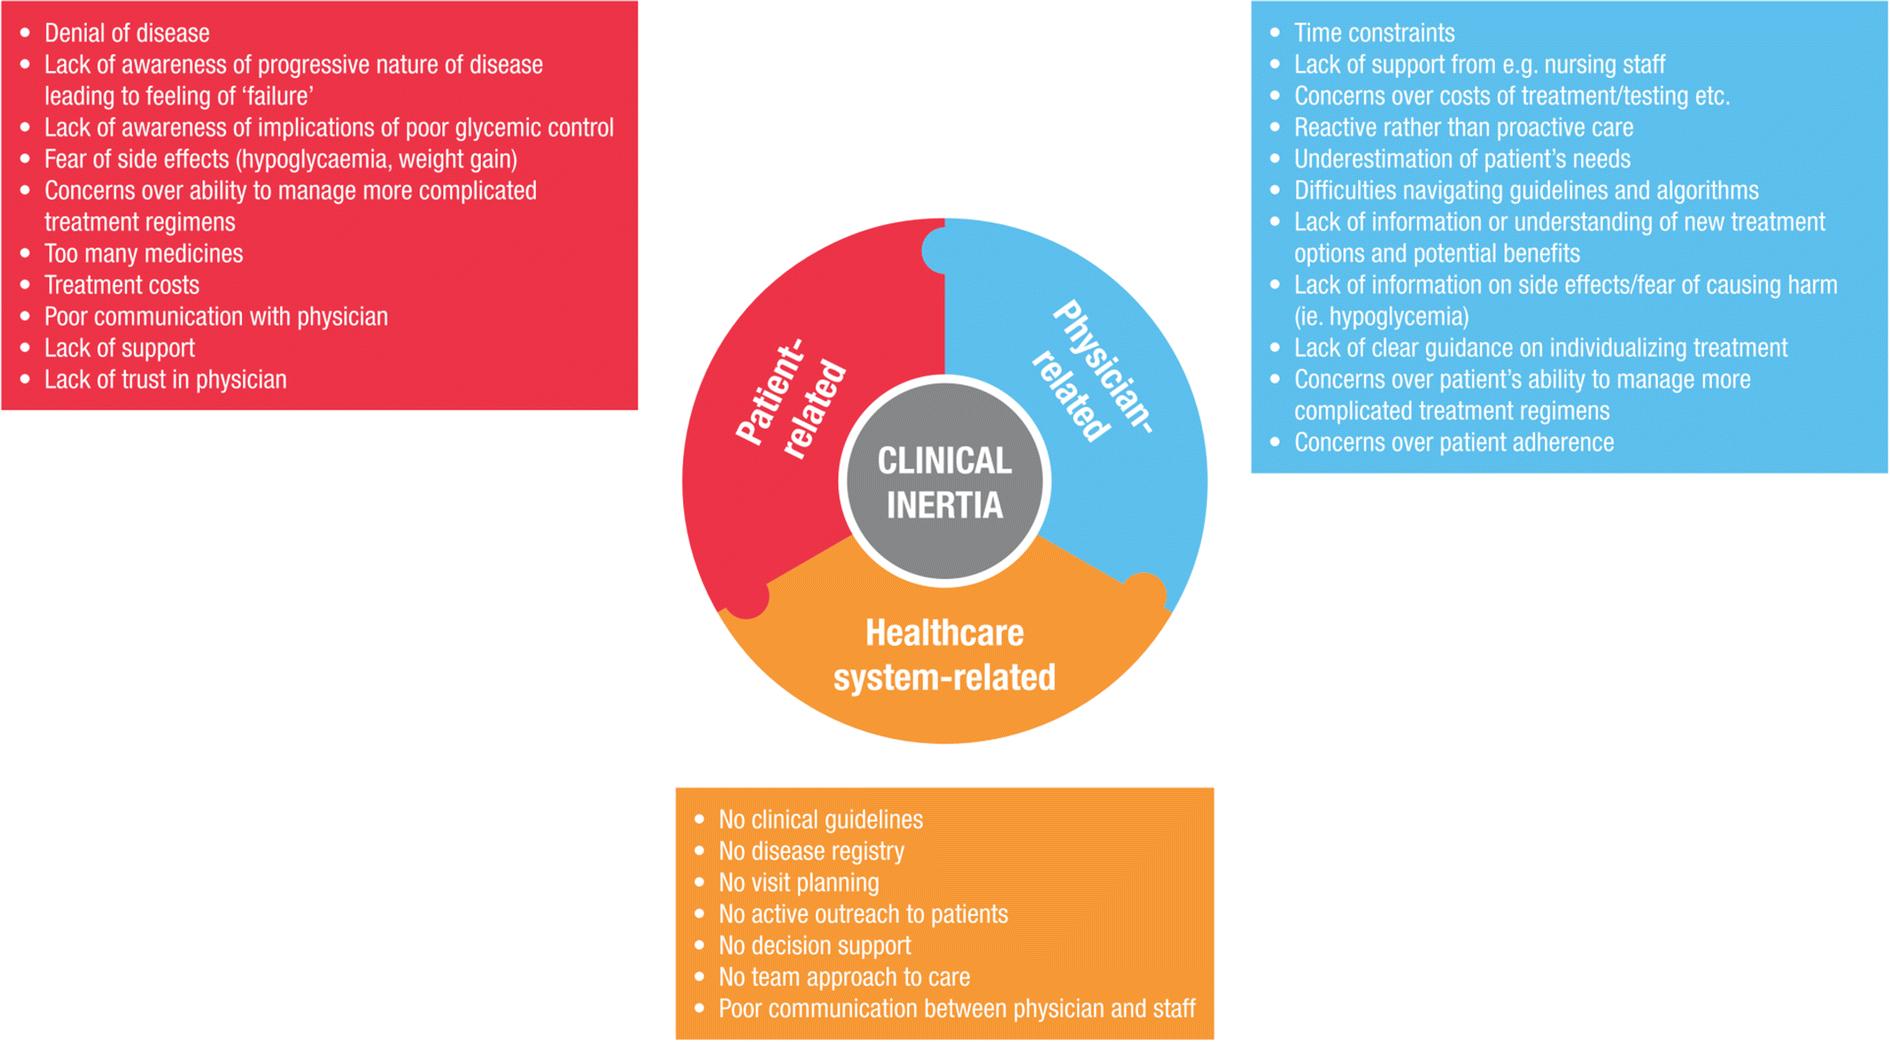 Addressing Clinical Inertia in Type 2 Diabetes Mellitus: A